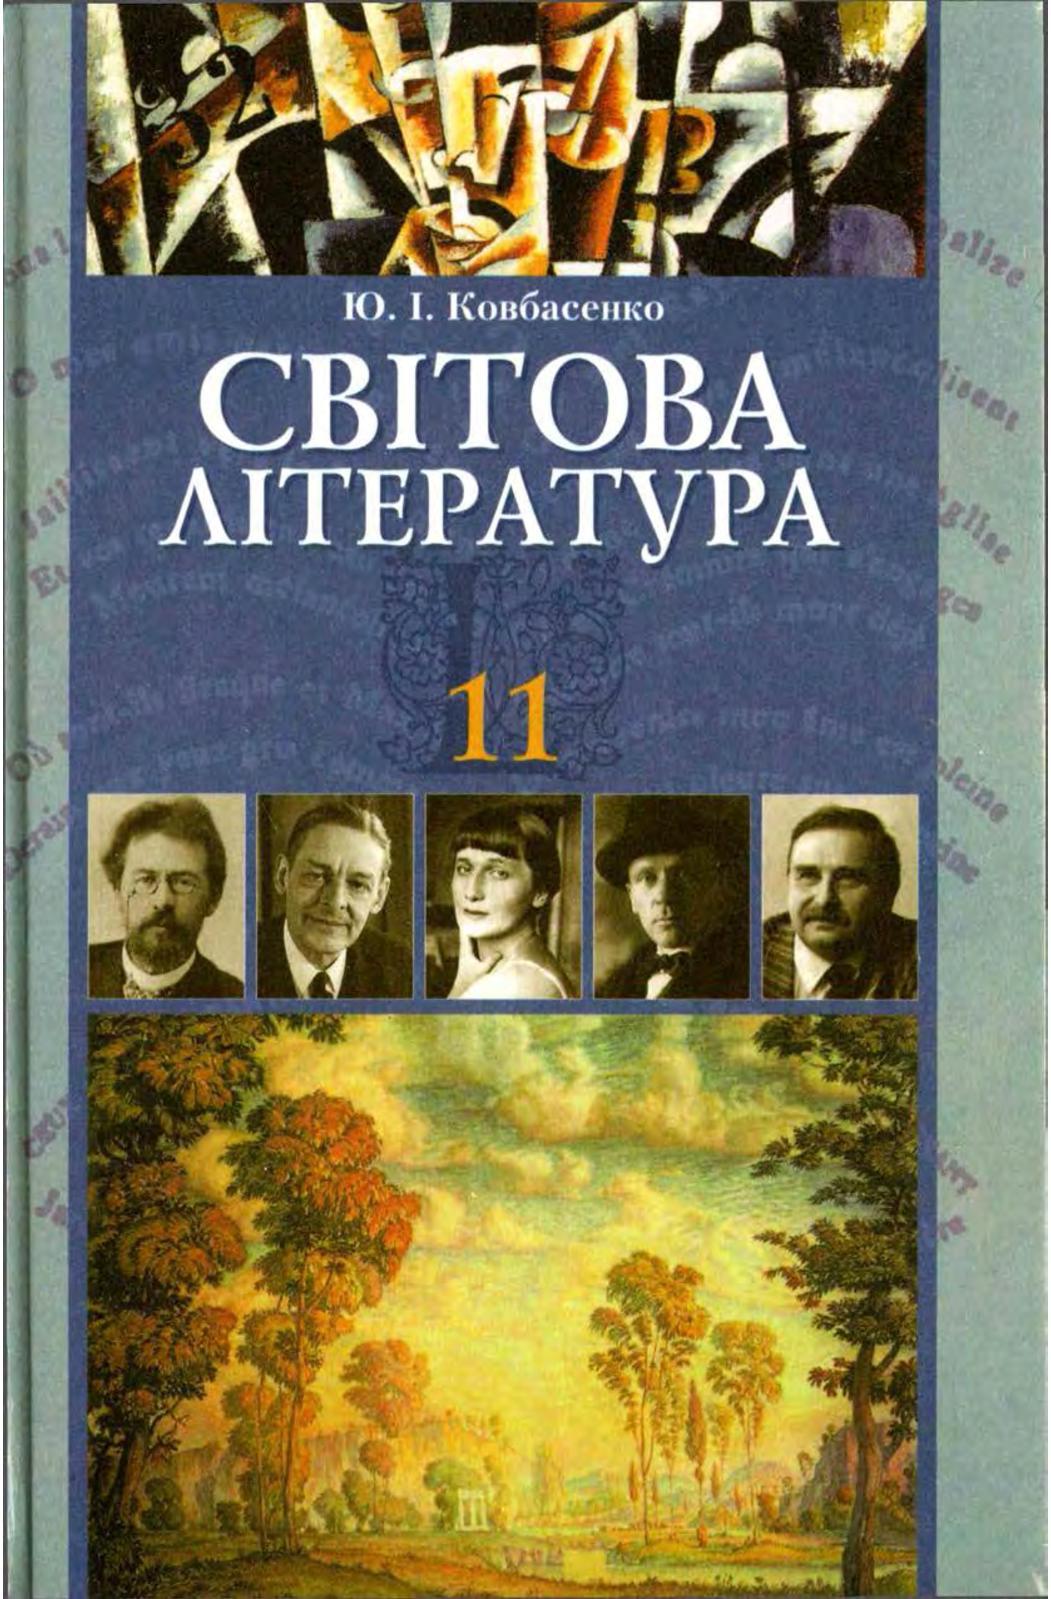 Calaméo - 11 клас. Світова література (Ковбасенко) - 2011 34196507c4f14